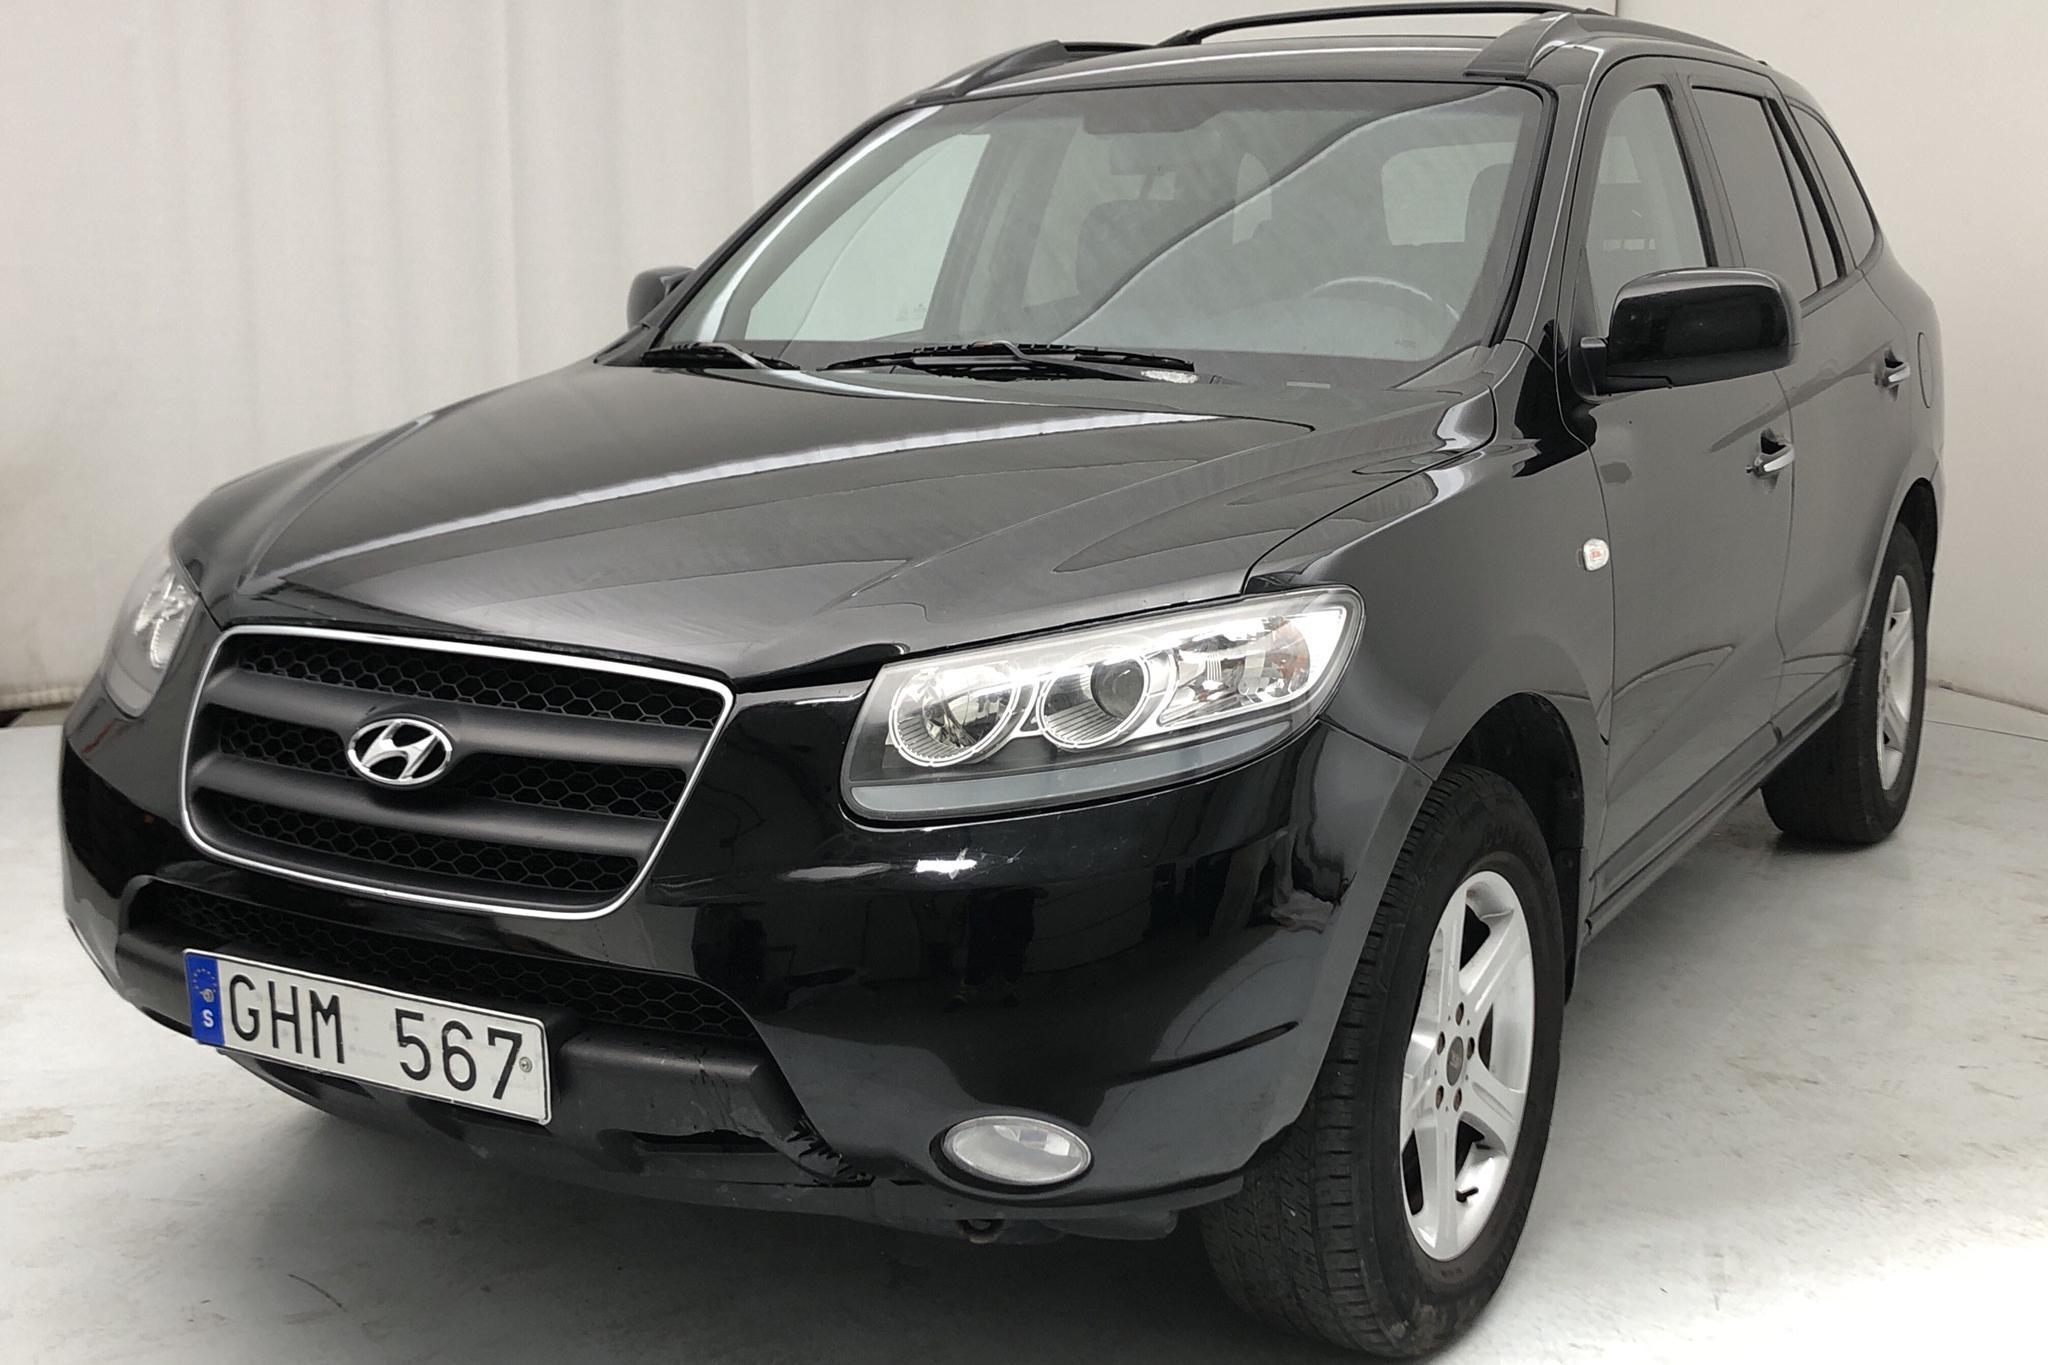 Hyundai Santa Fé 2.2 CRDi (155hk) - 166 820 km - Automatic - black - 2008